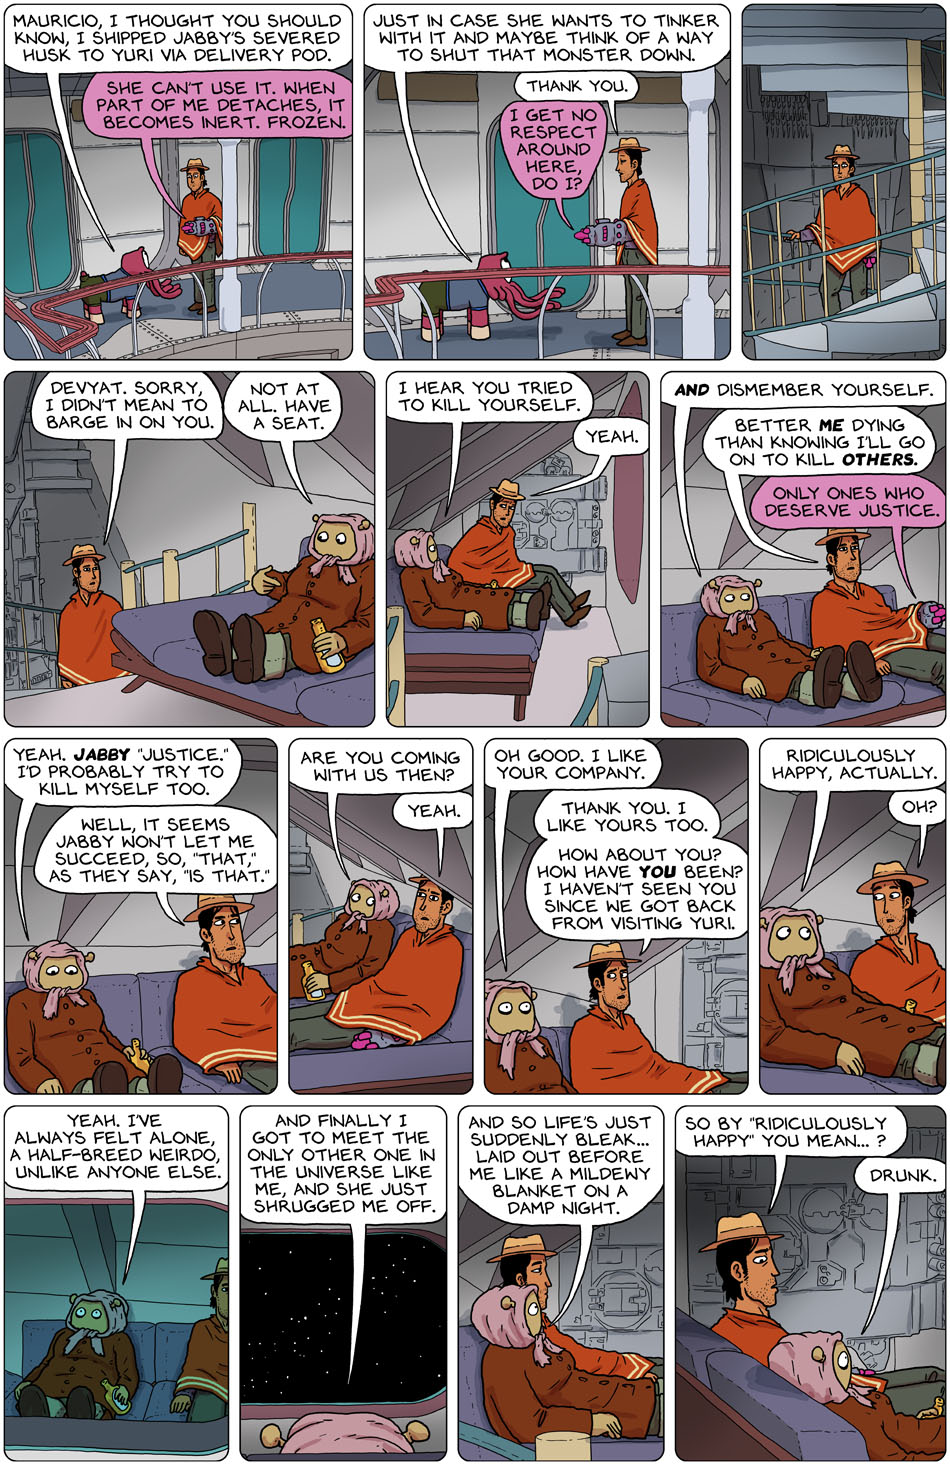 2017-02-13-spacetrawler2